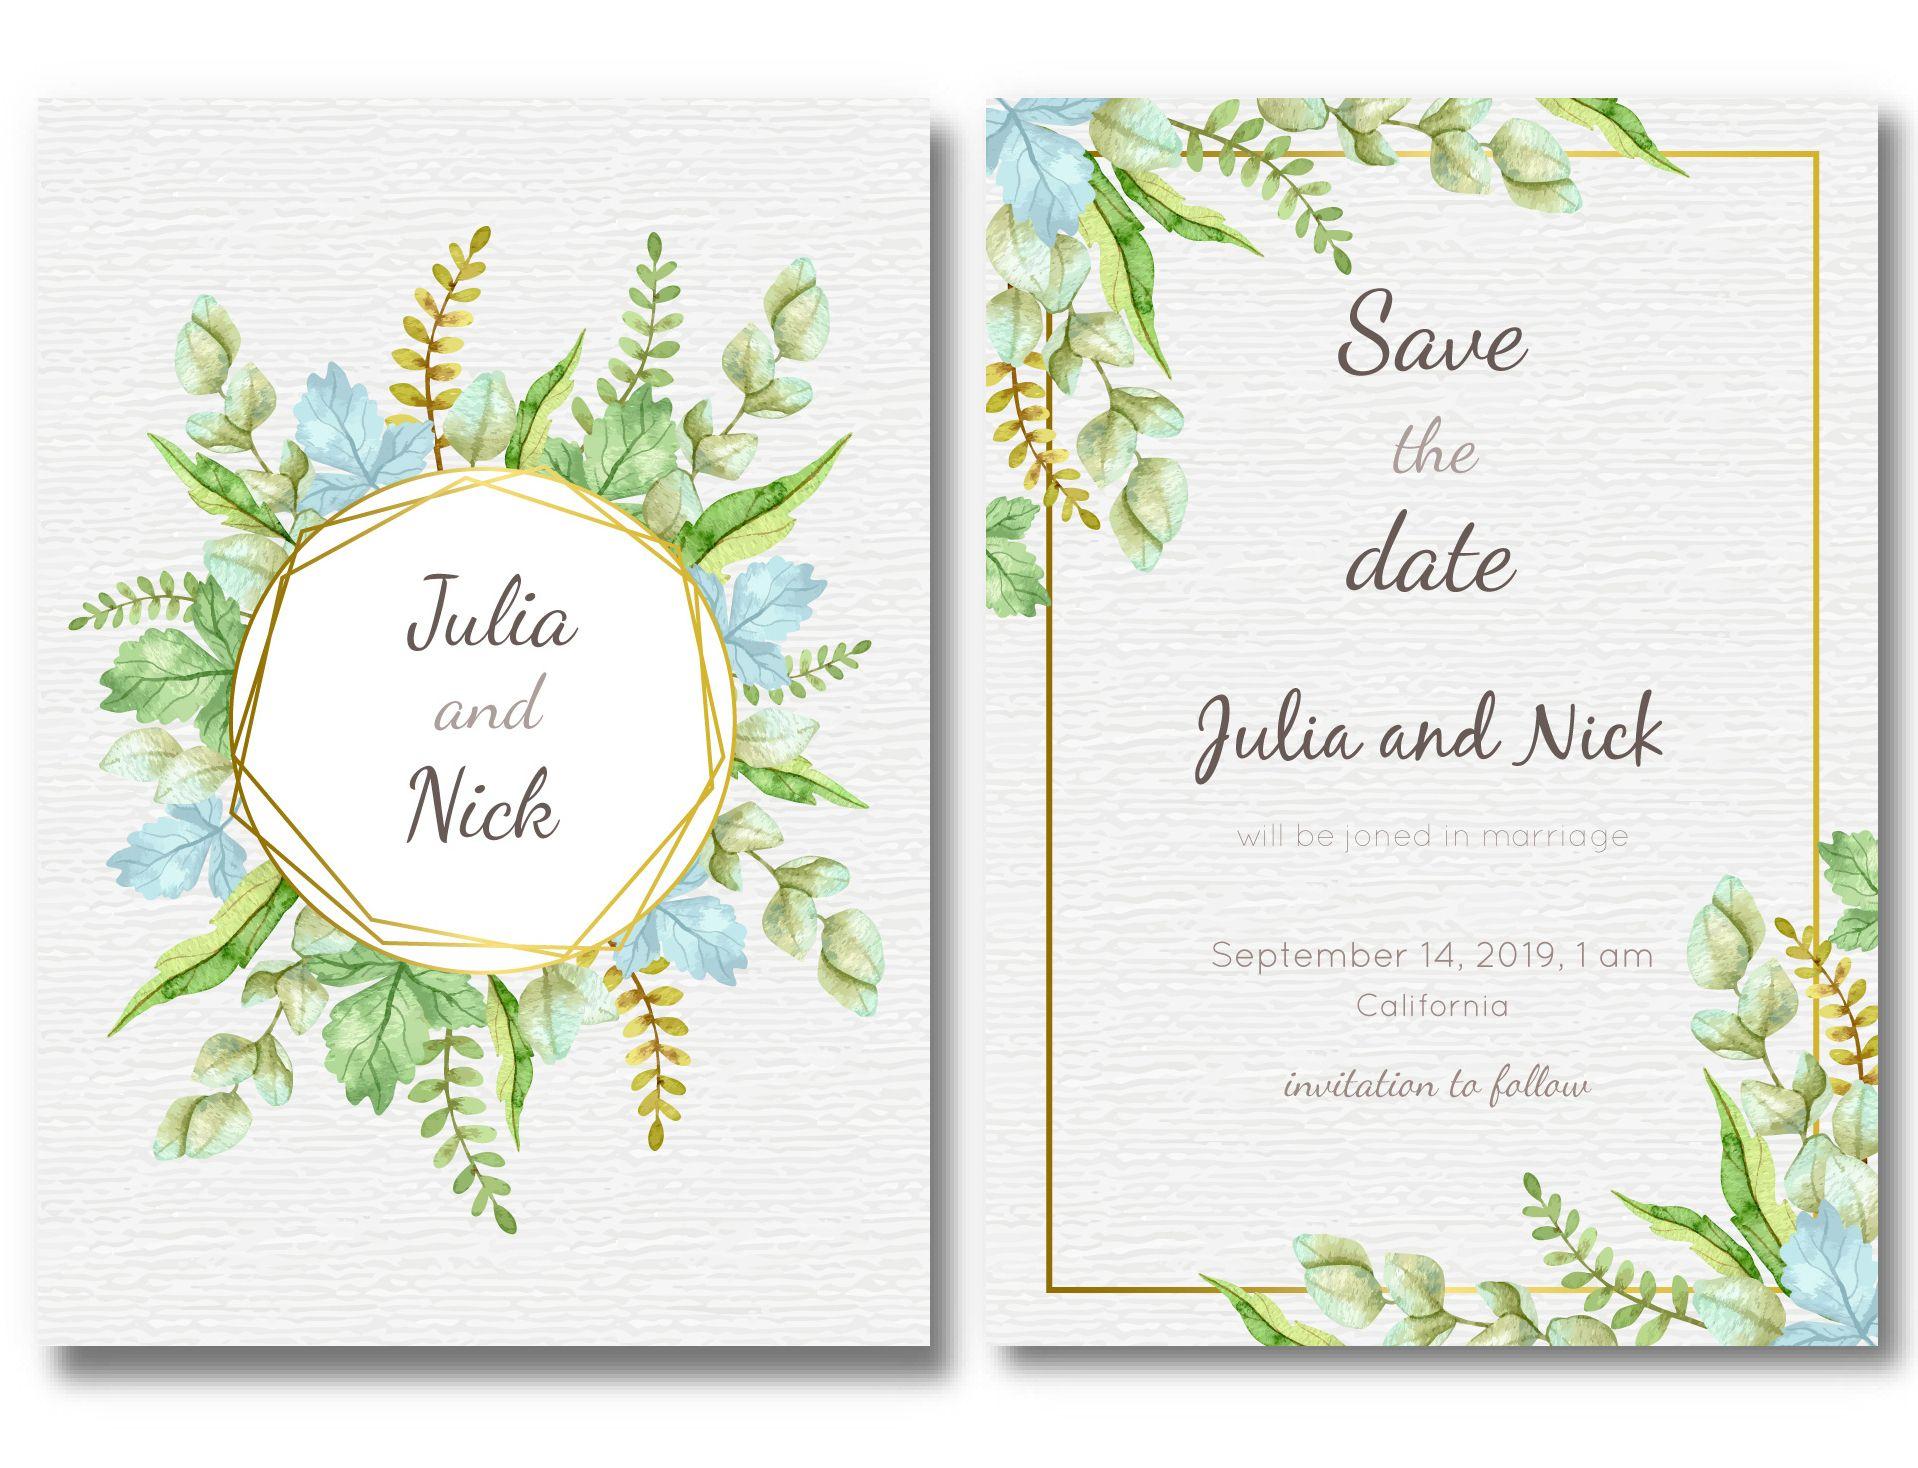 lovely green leaves wedding invitation template